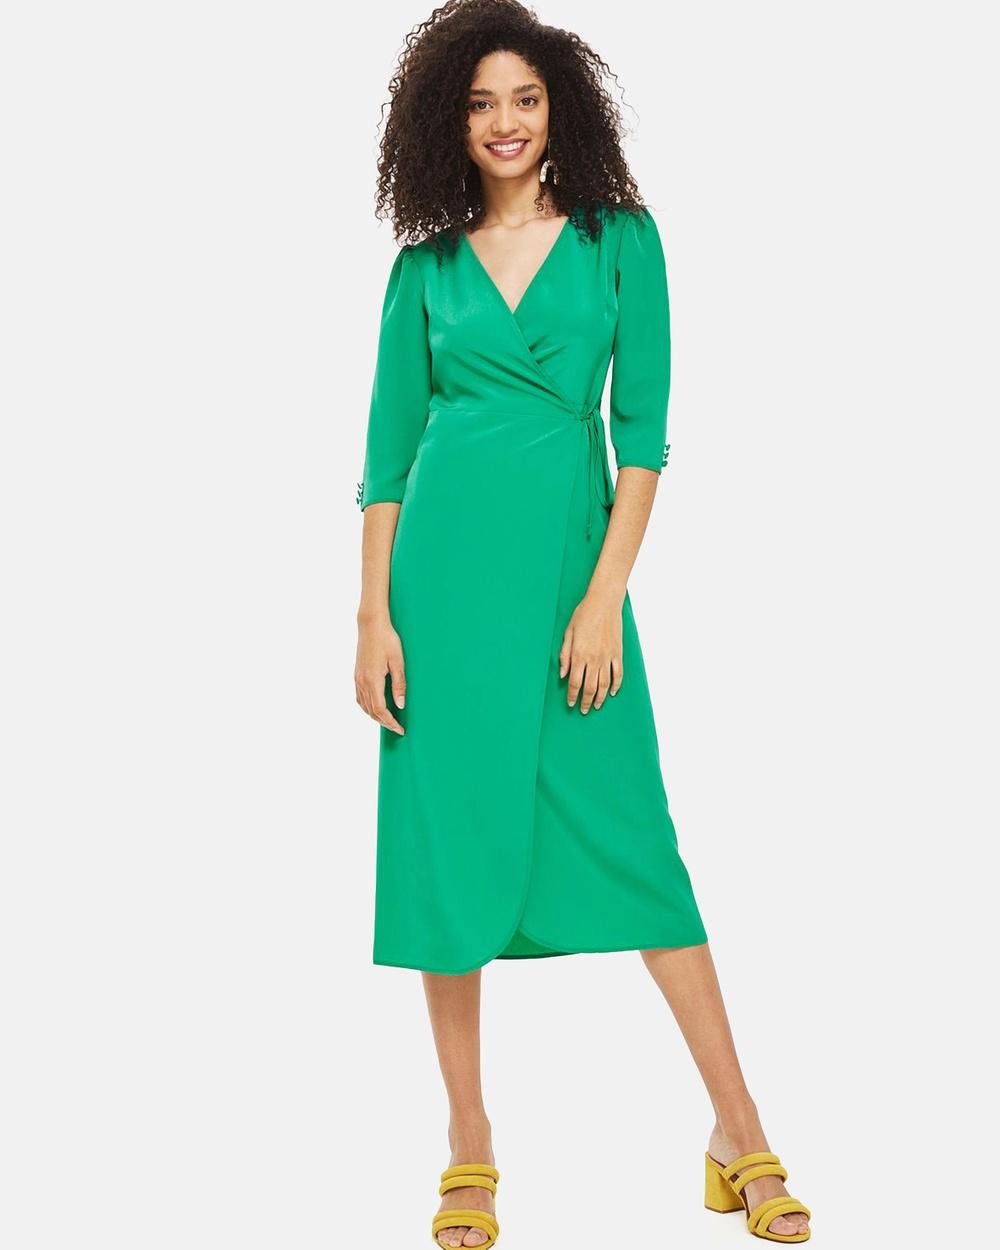 TOPSHOP Crepe Wrap Midi Dress Dresses Bright Green Crepe Wrap Midi Dress